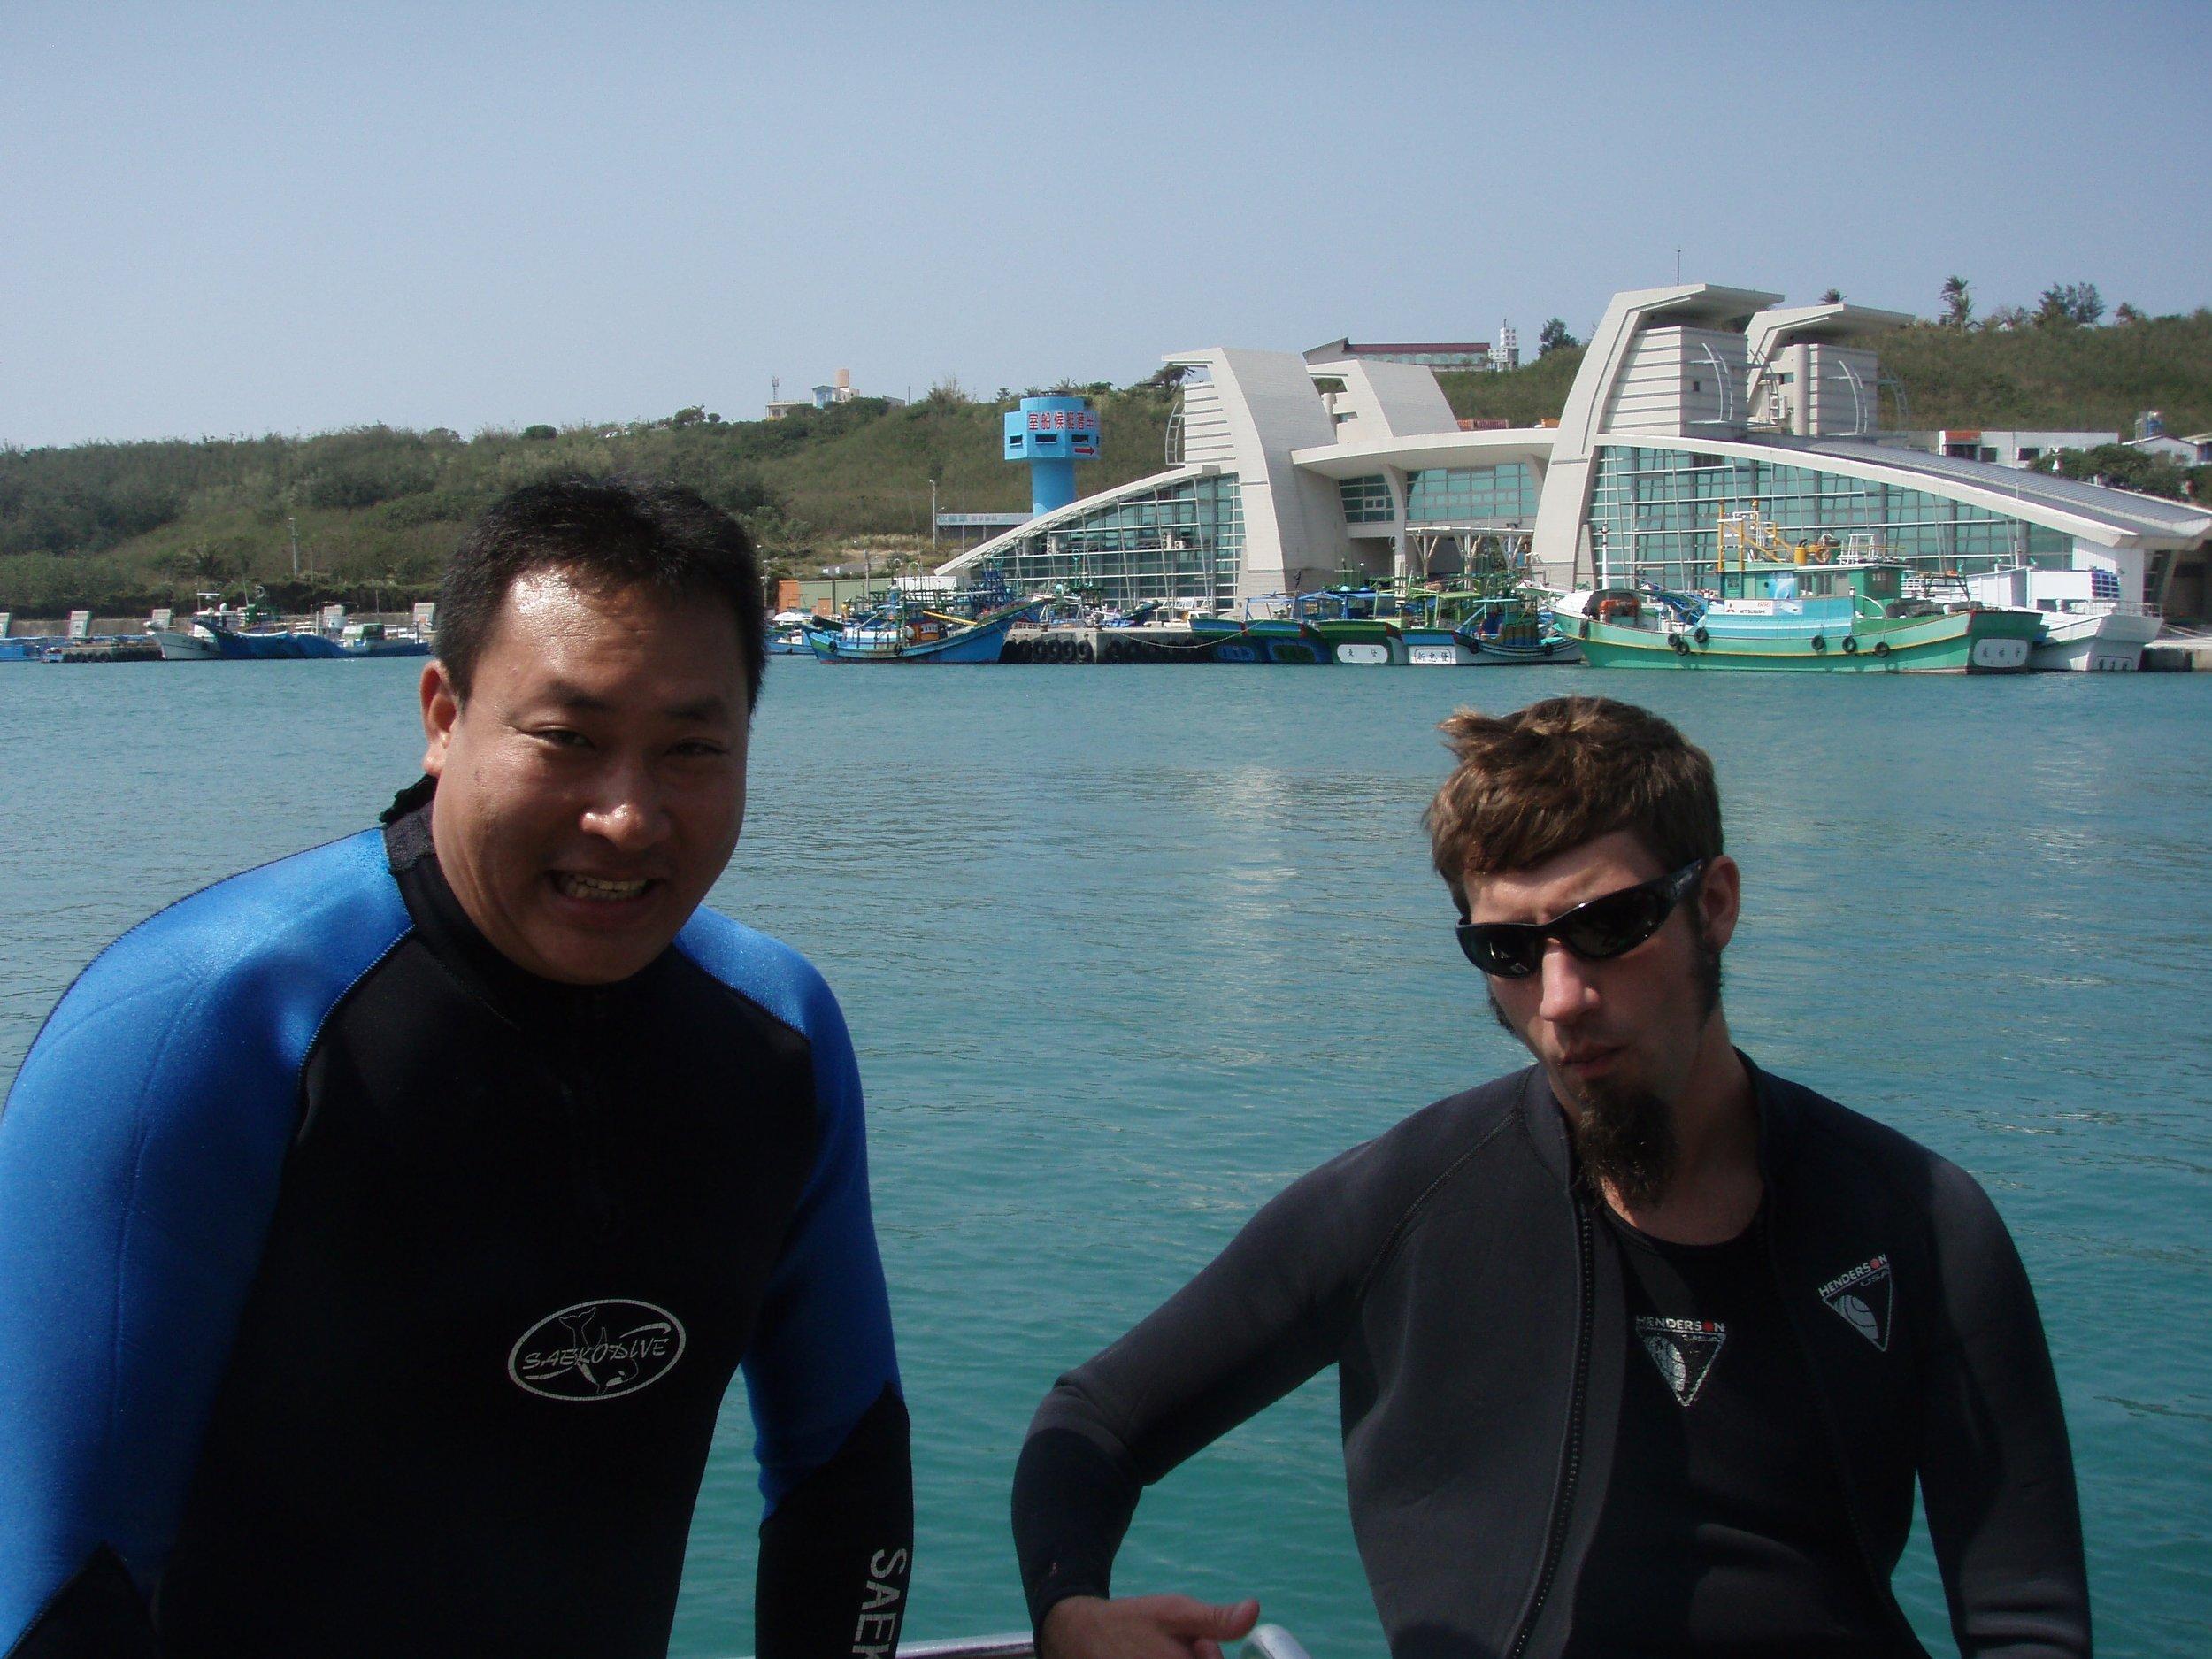 weijay, me, and coast guard.jpg